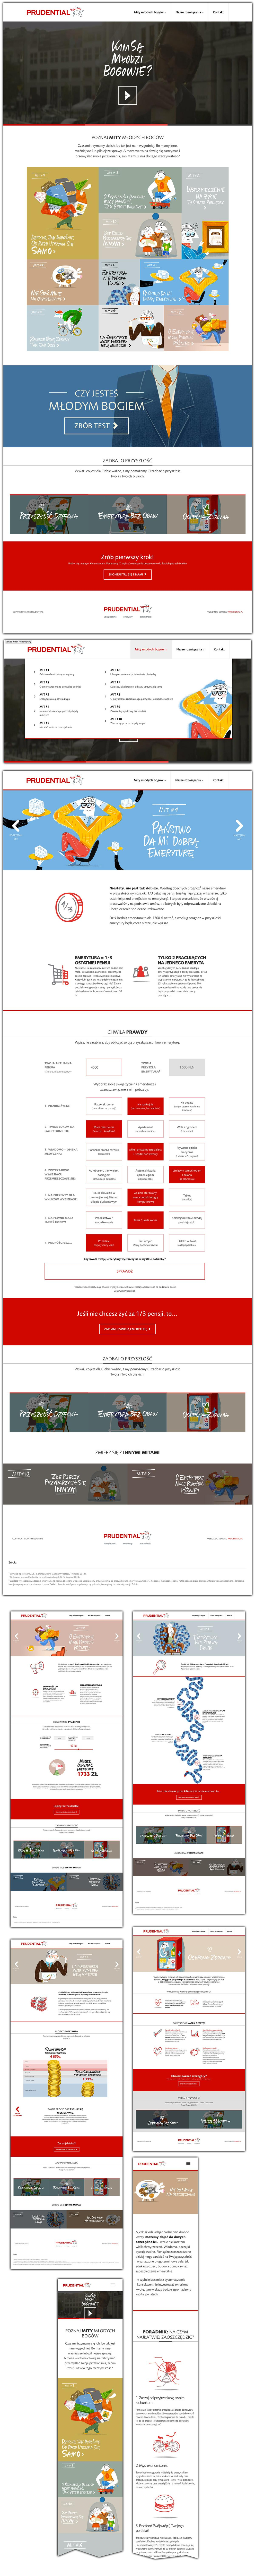 HTML css web animations adobe edge php